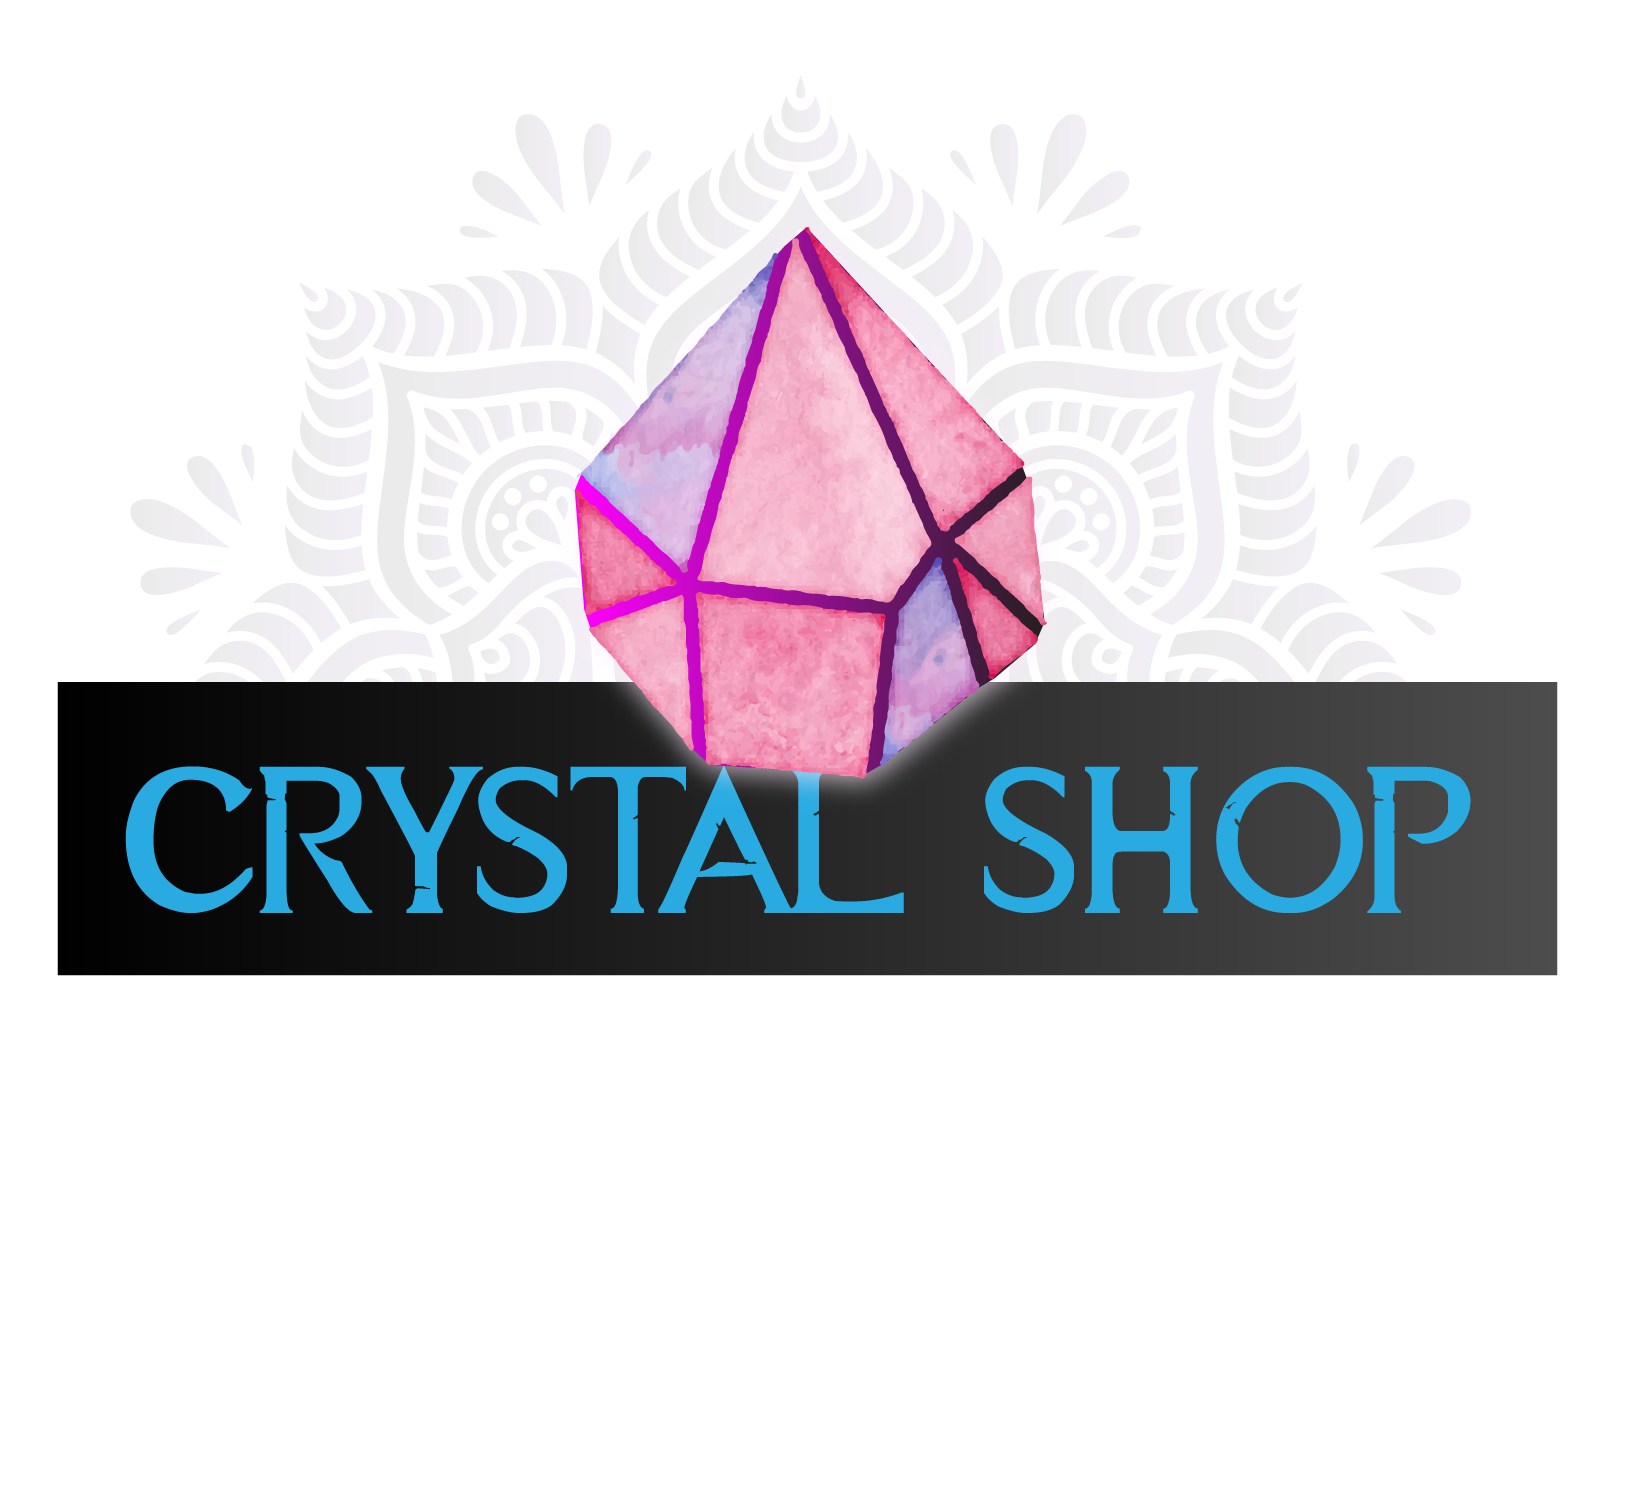 Crystal Shop Online #1 - Healing Crystals For [ Sale 20%]